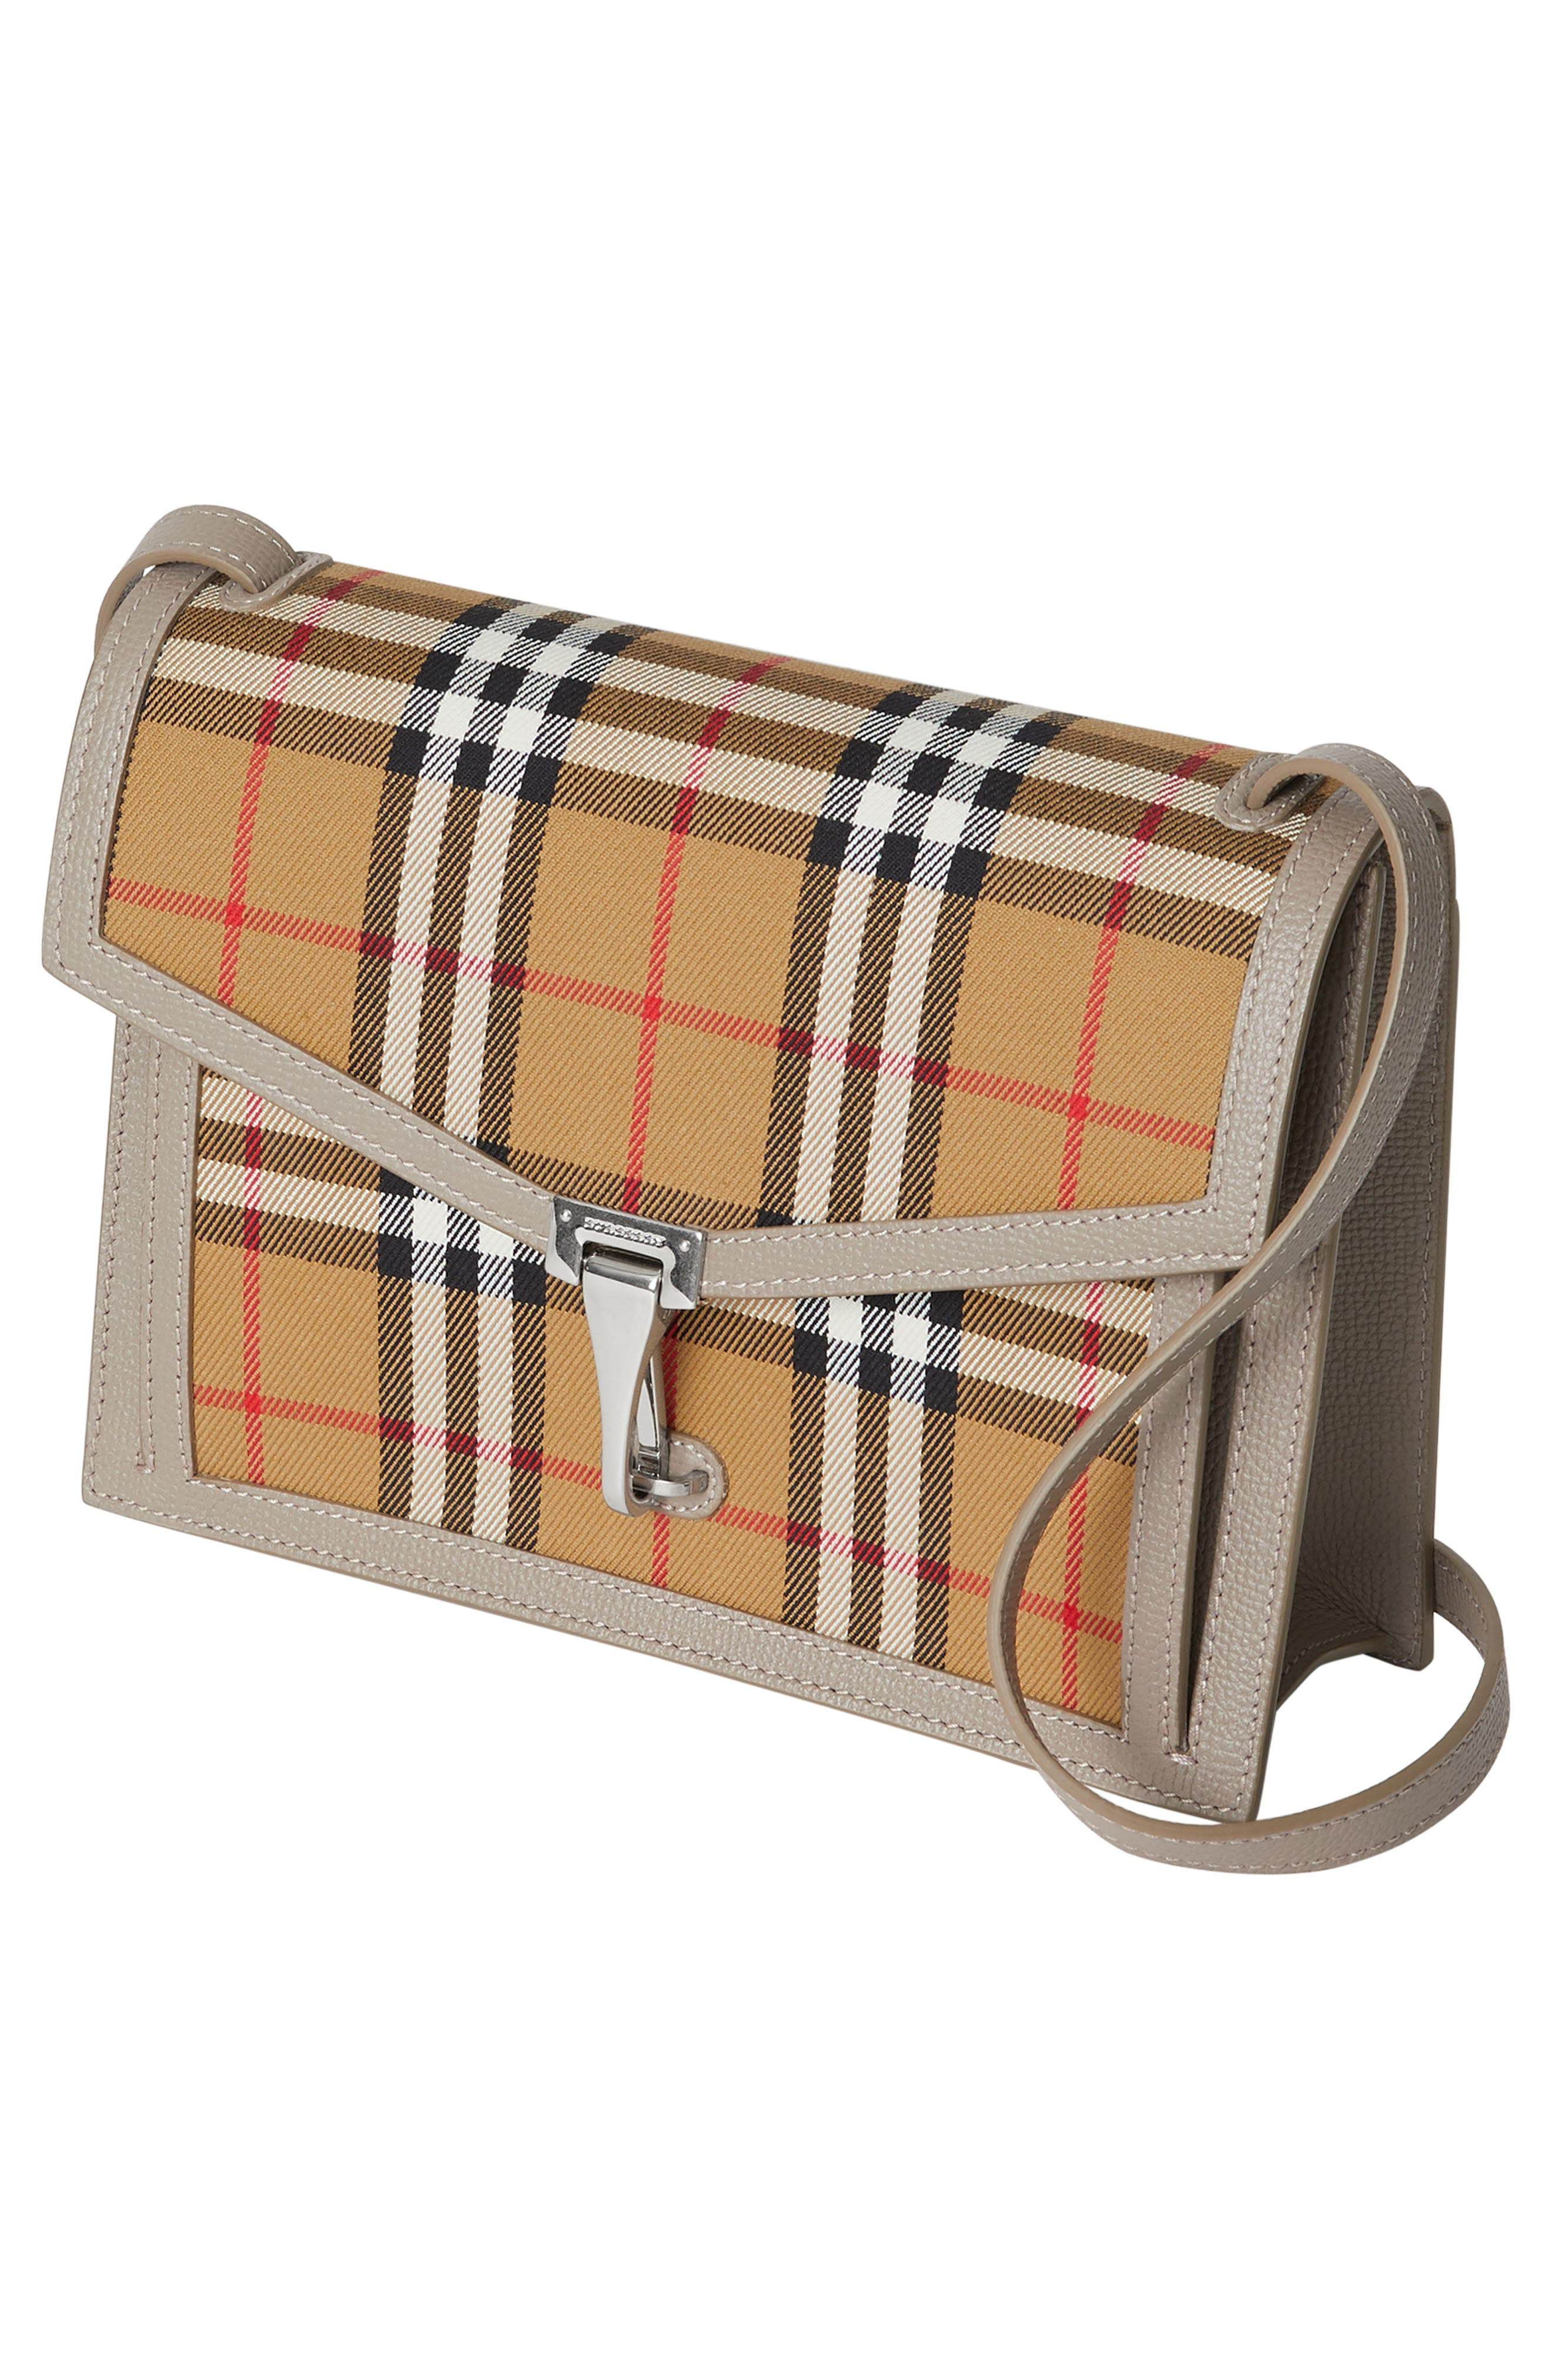 Small Macken Vintage Check Crossbody Bag,                             Alternate thumbnail 5, color,                             TAUPE BROWN